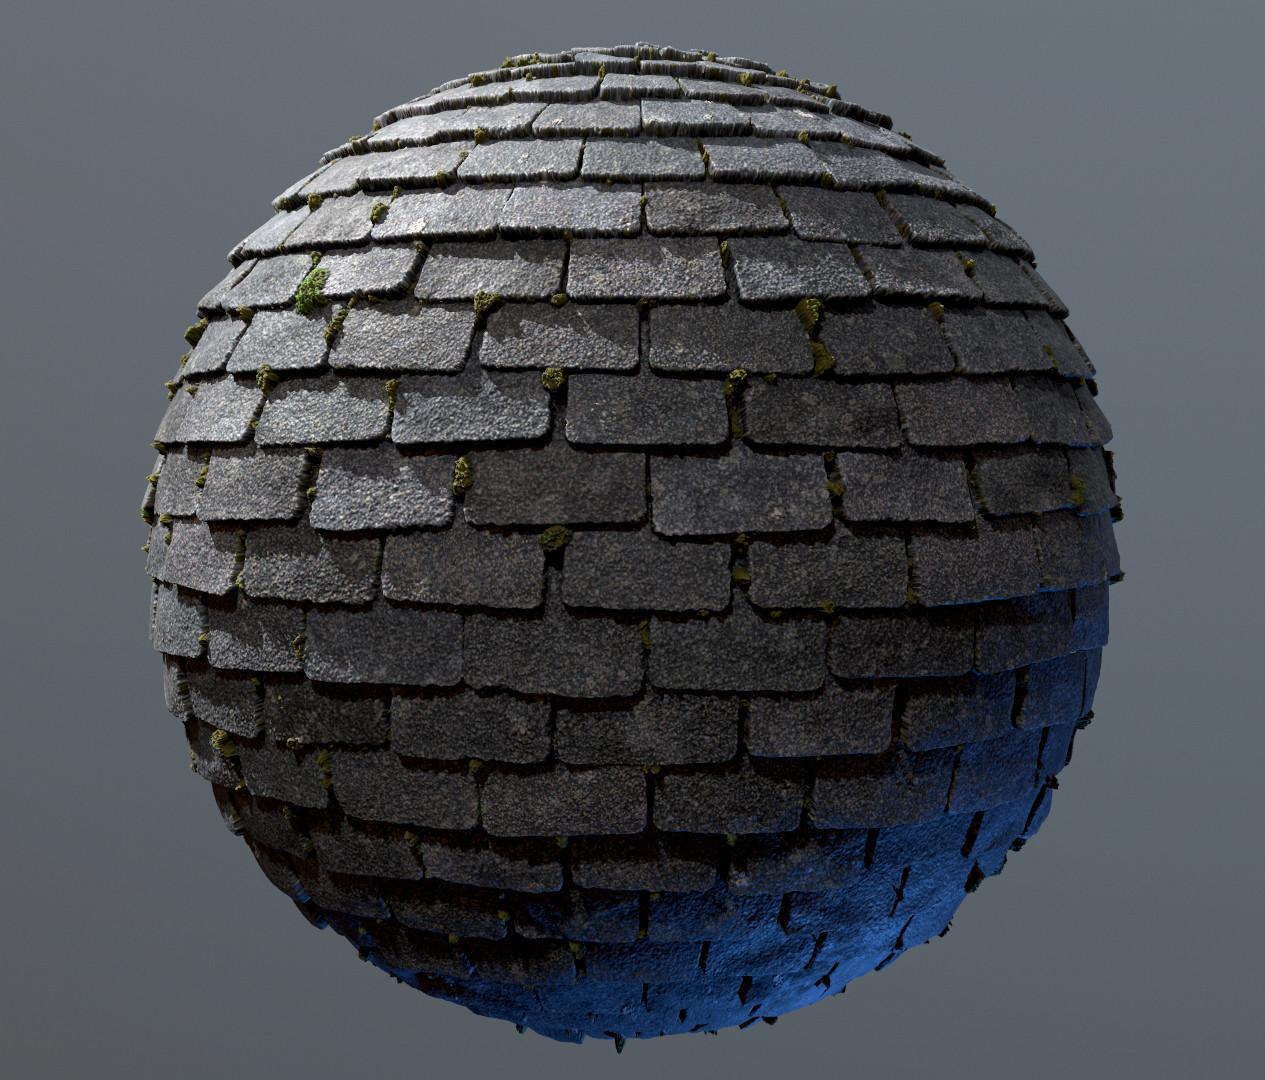 Kurt kupser textures 0004a 0000 roof shingles 1